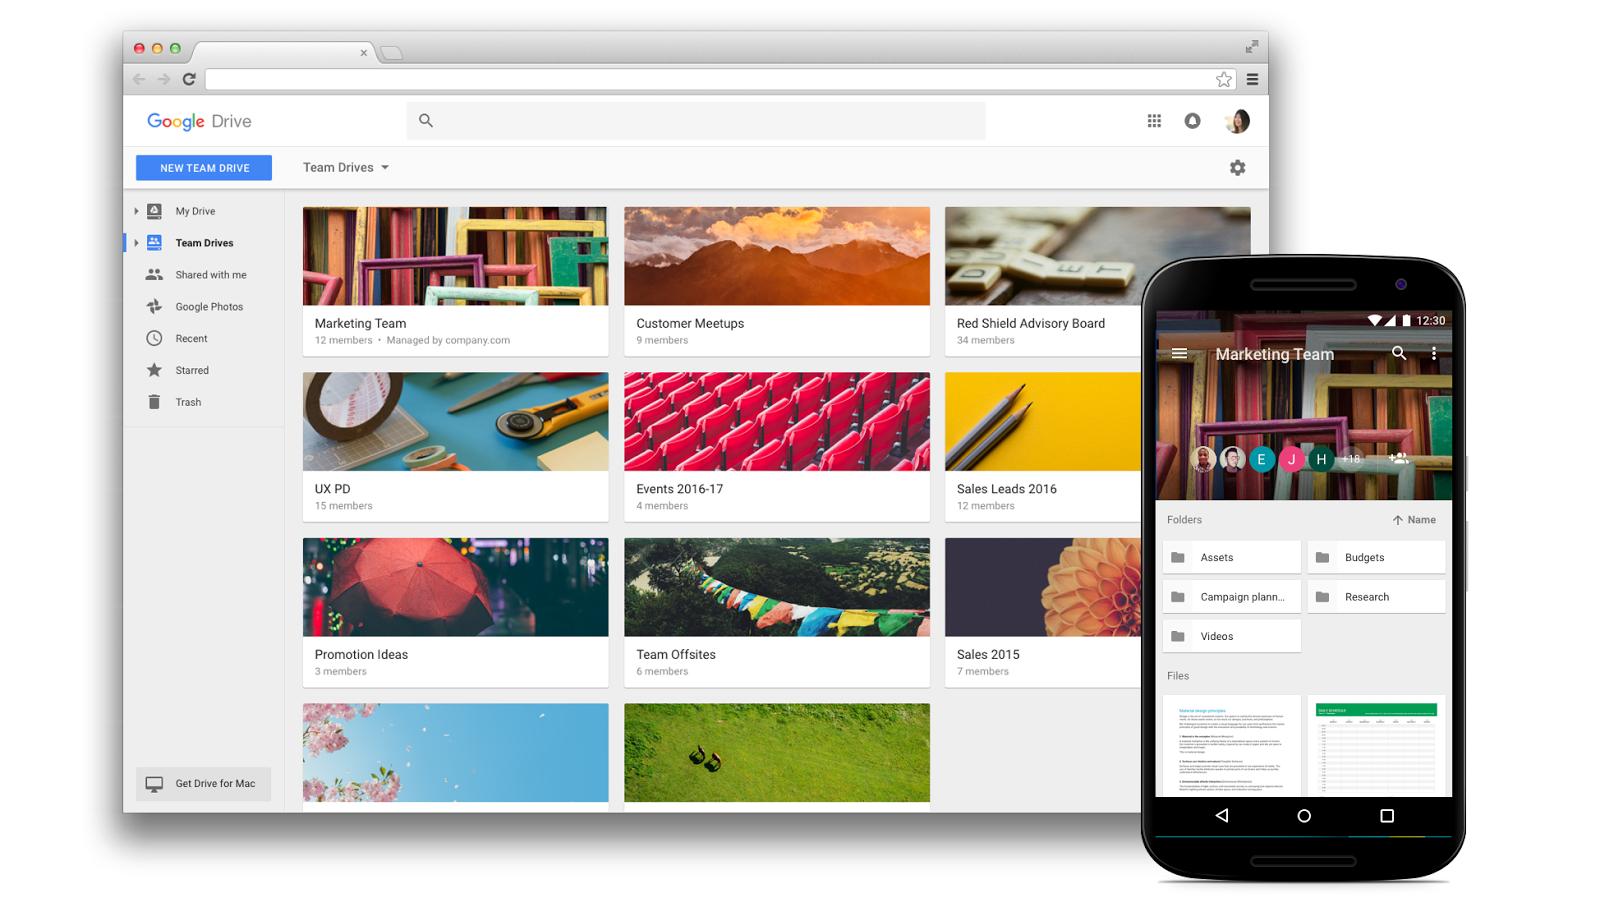 G Suite - Google Drive for Teams